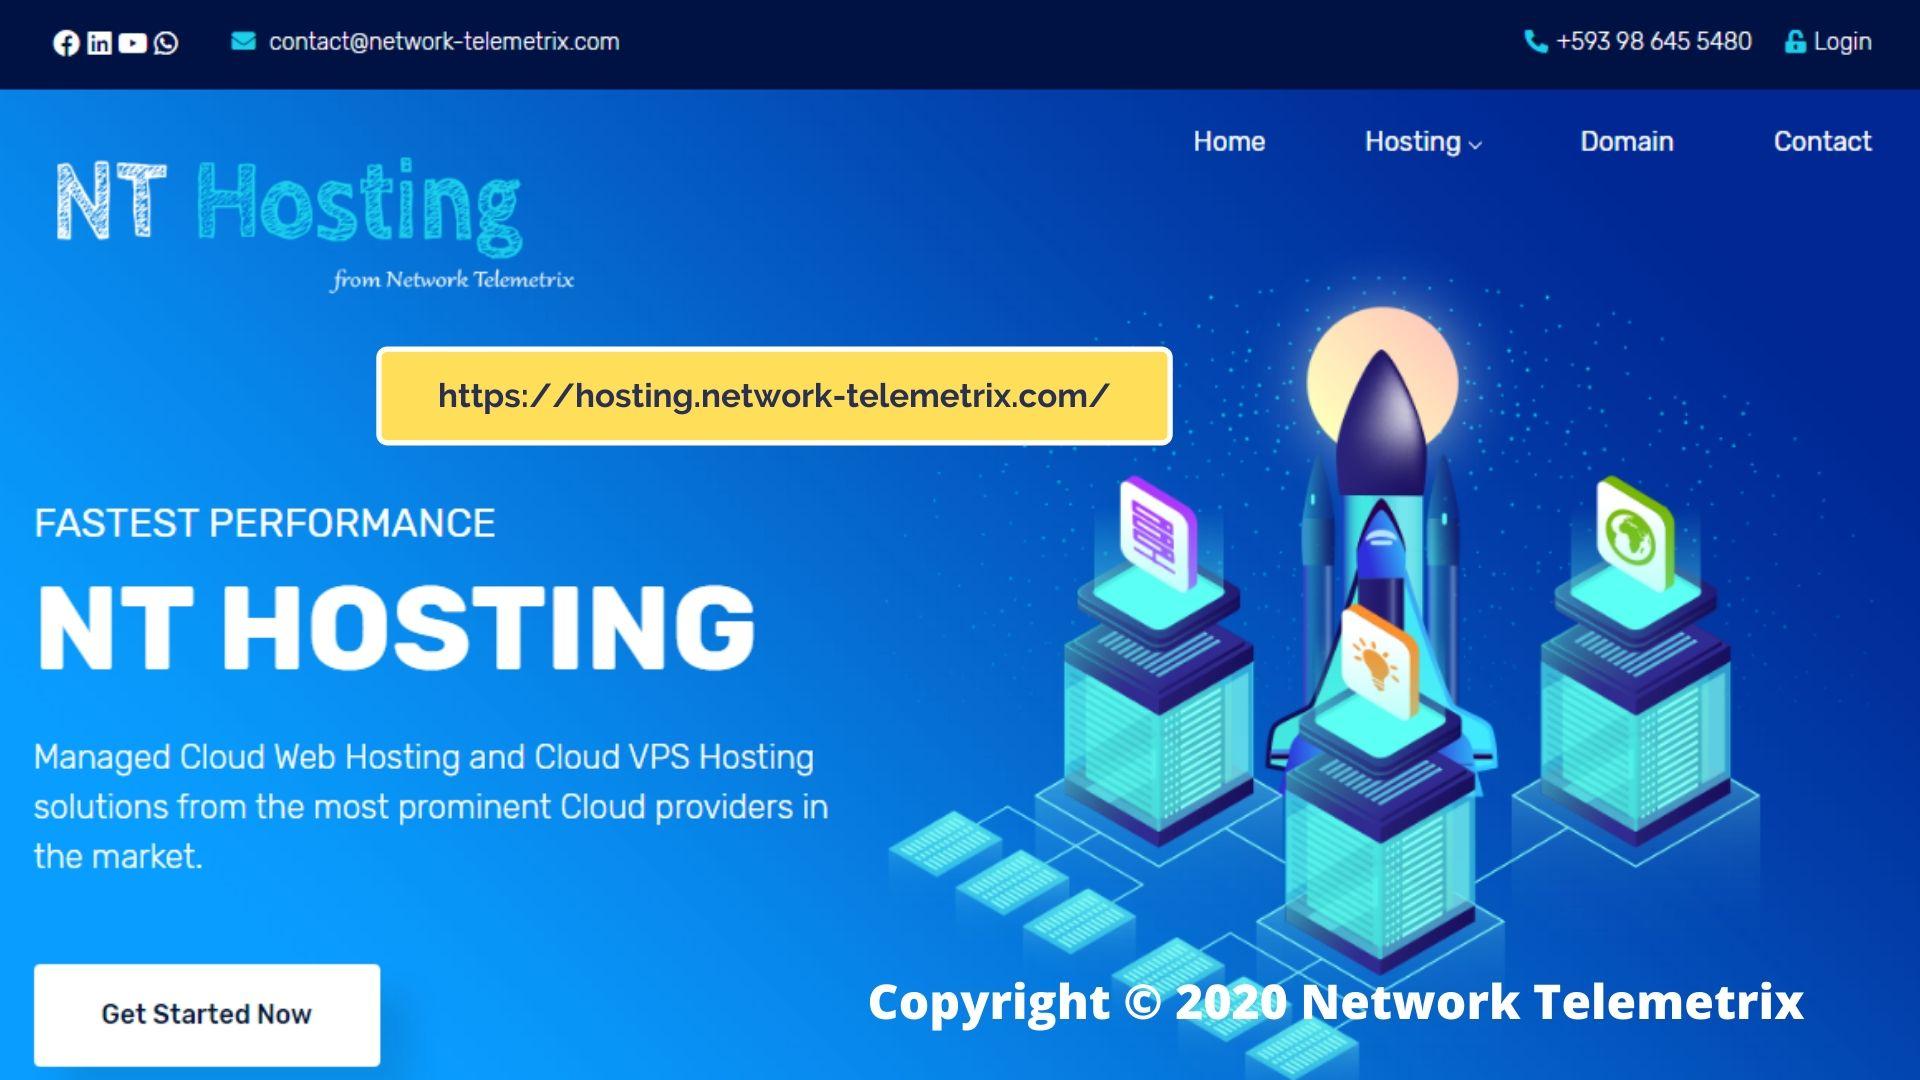 NT-Hosting-1